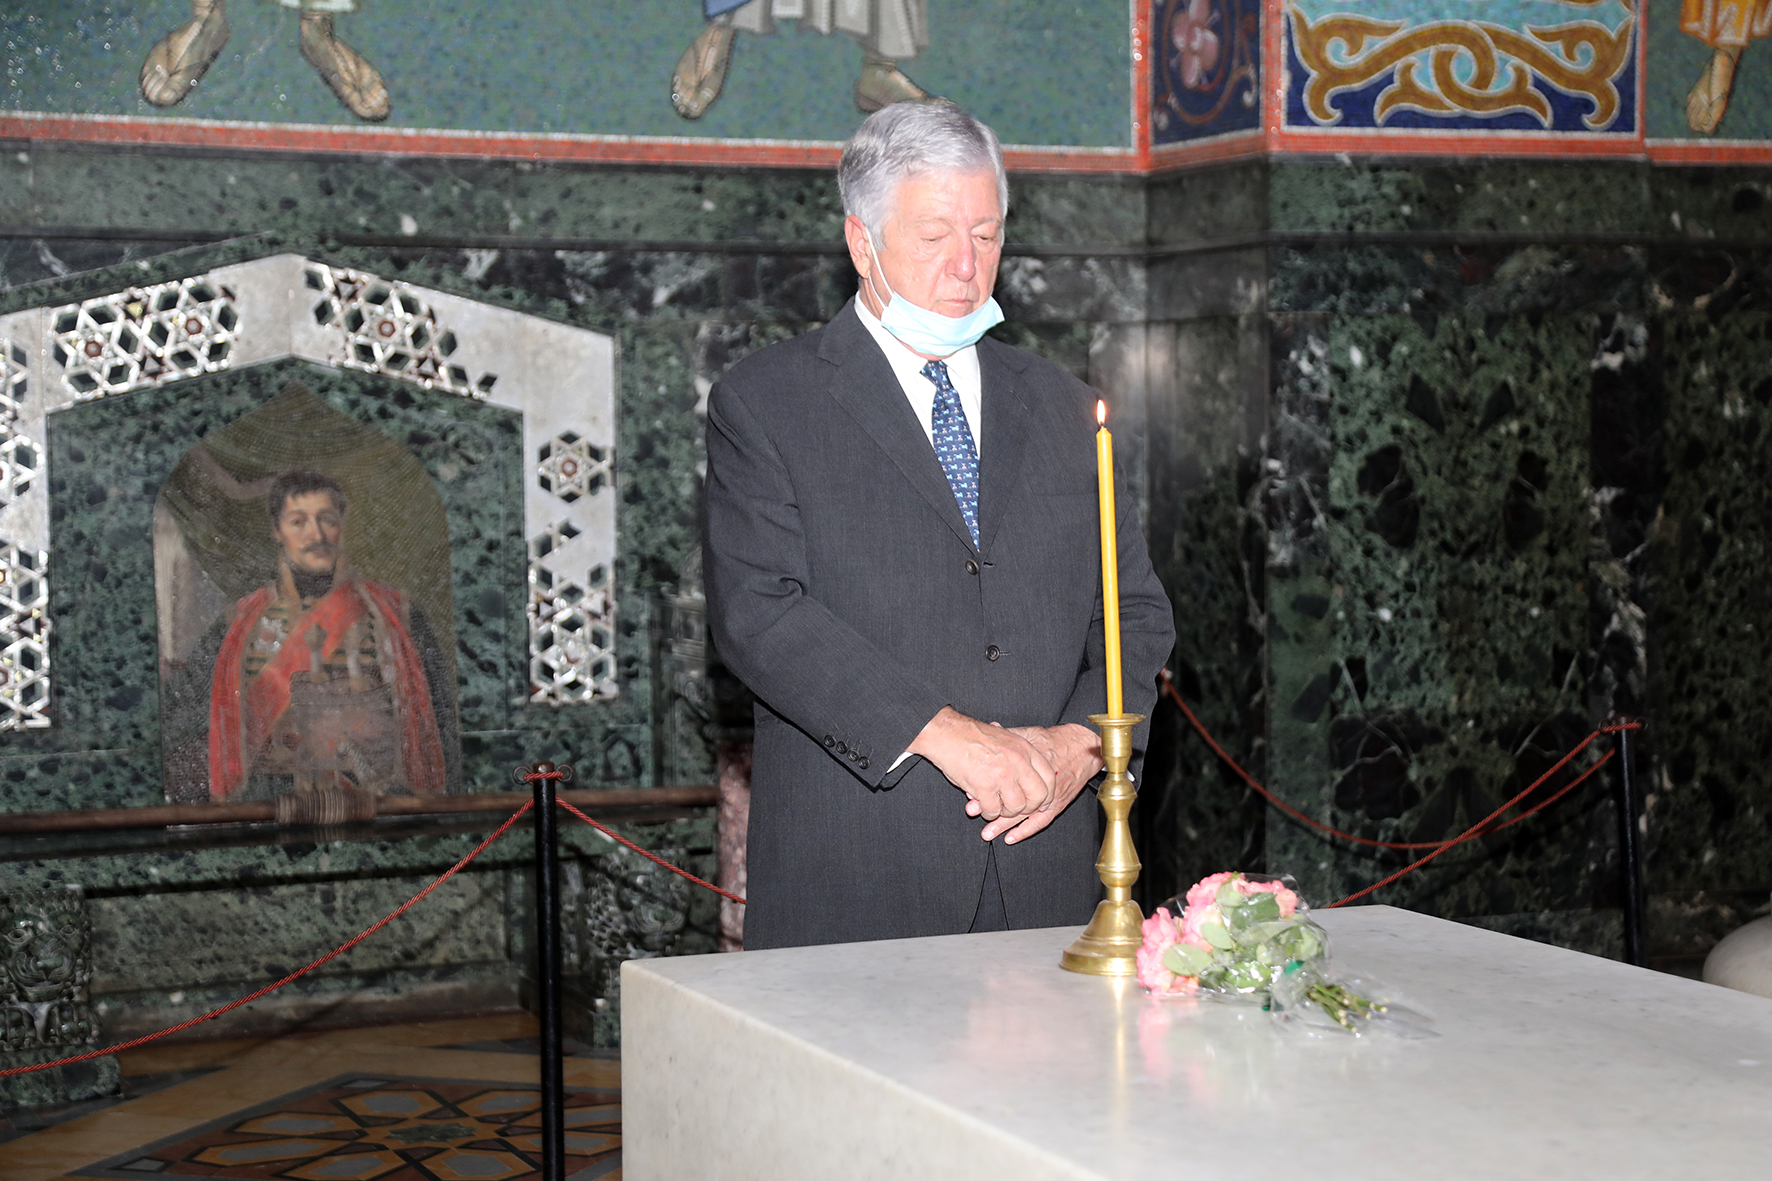 Њ.К.В. Престолонаследник Александар пали свећу на Карађорђевом гробу